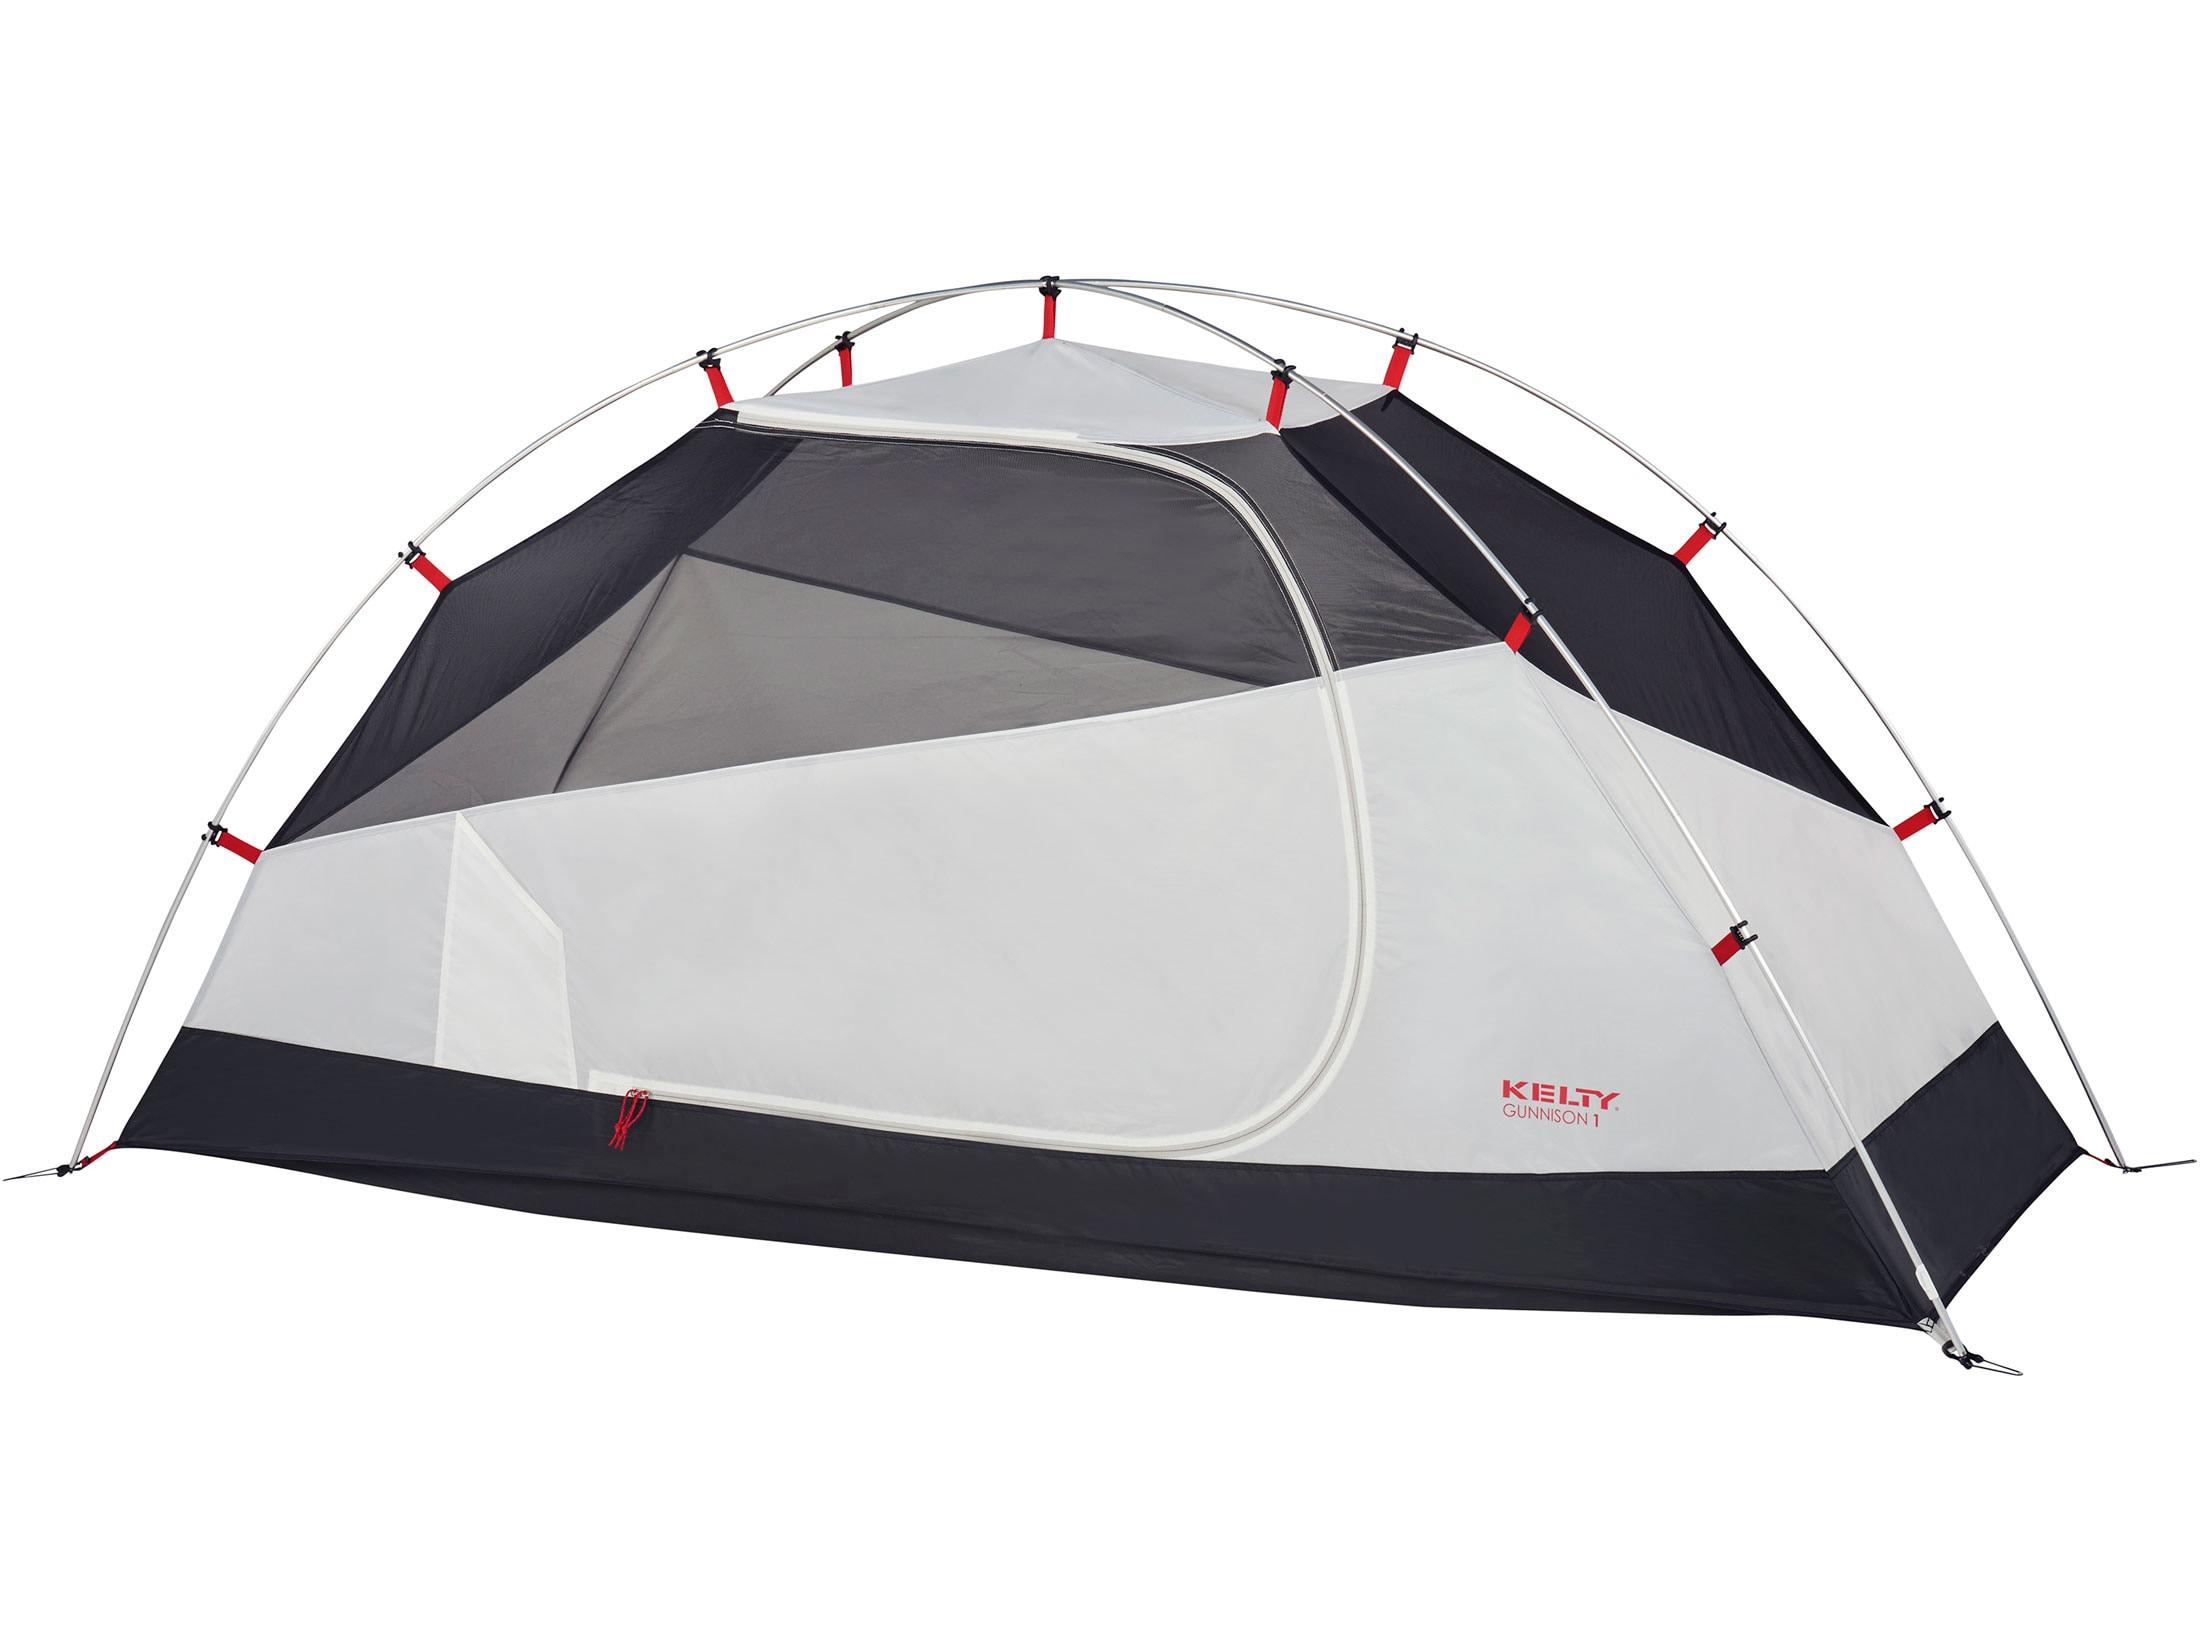 Kelty Gunnison 1 Person Dome Tent Footprint 89 x 29 x 43 ...